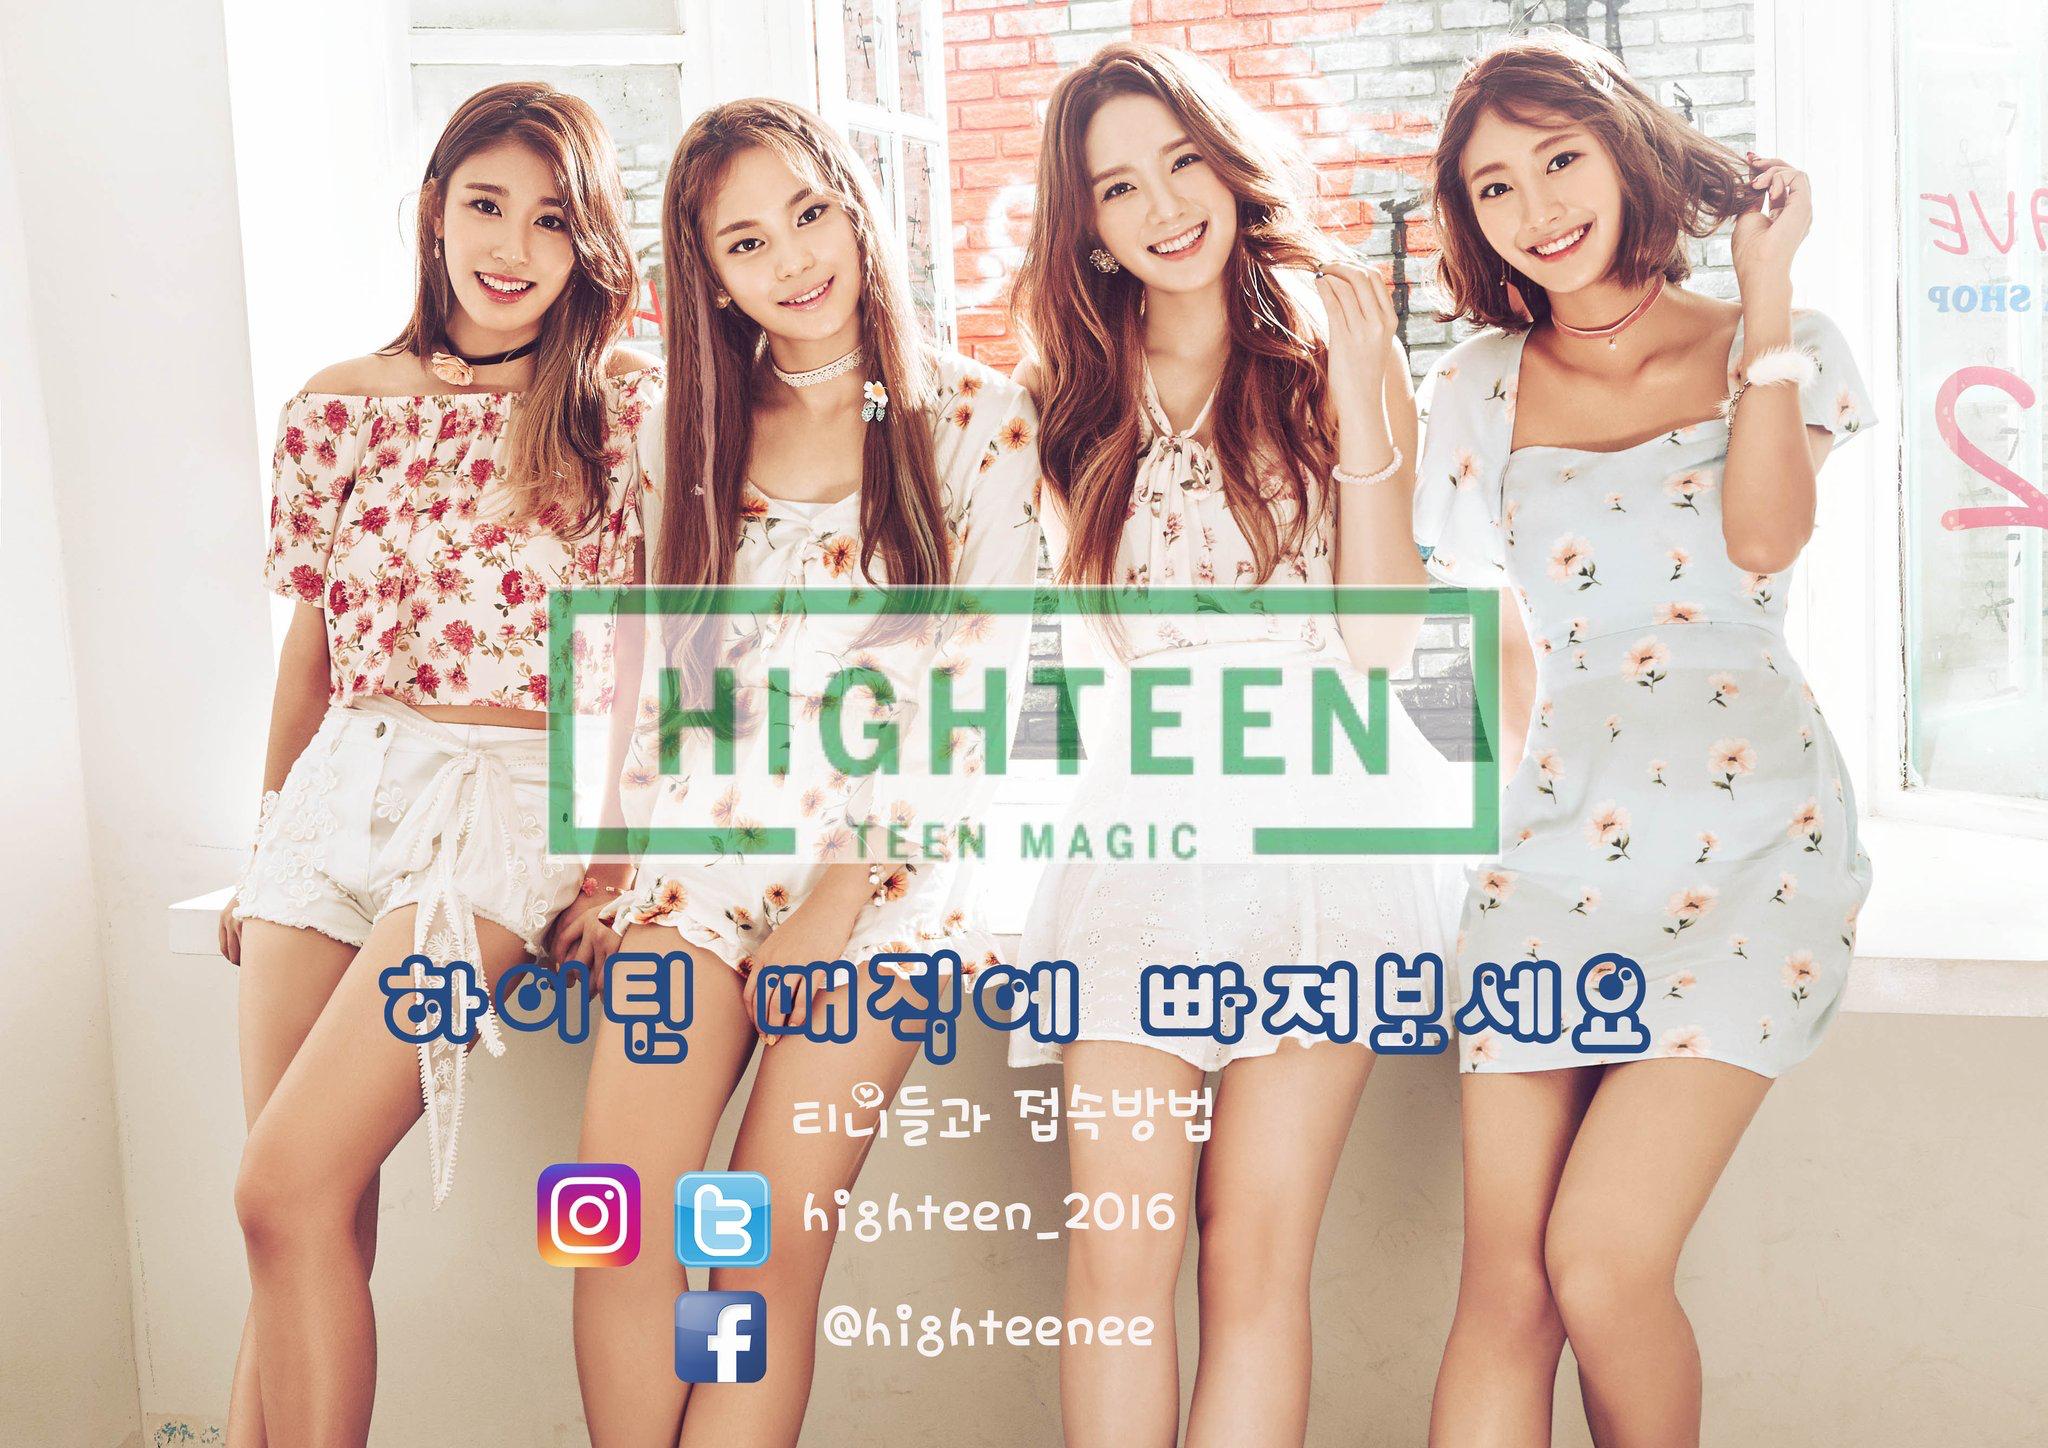 Highteen highteen pinterest highteen stopboris Image collections